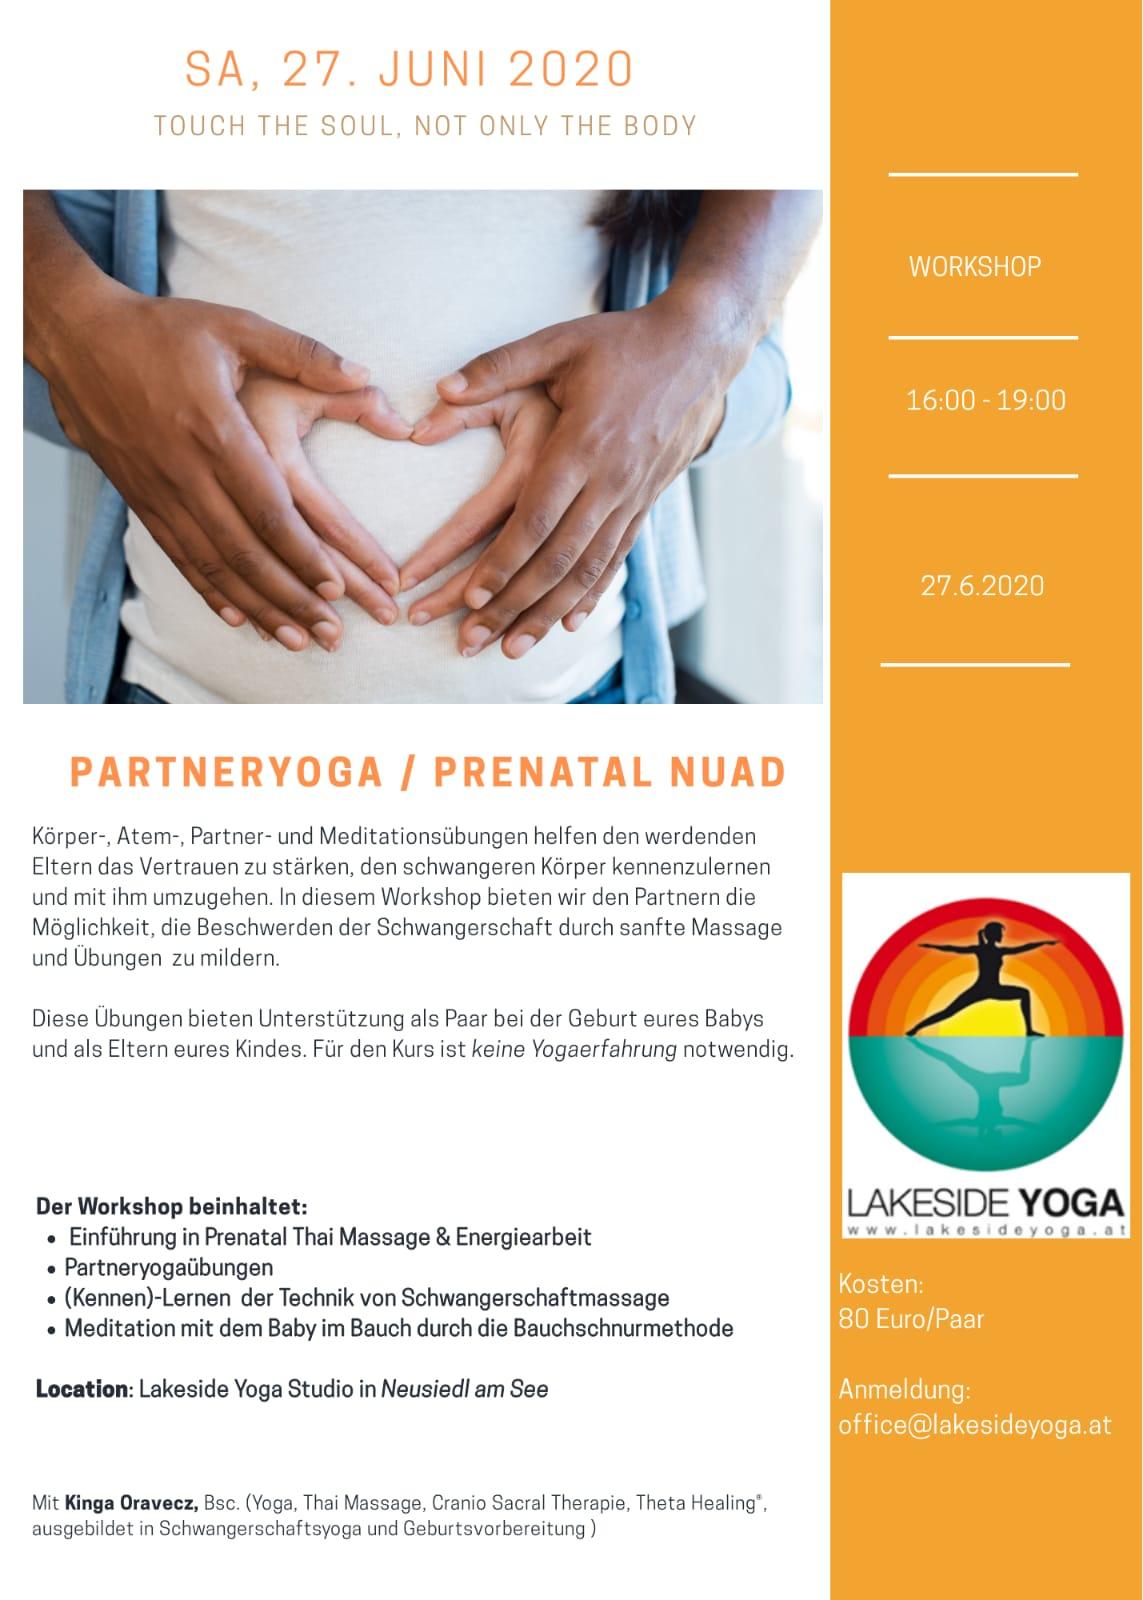 Partner Yoga/ Prenatal Nuad